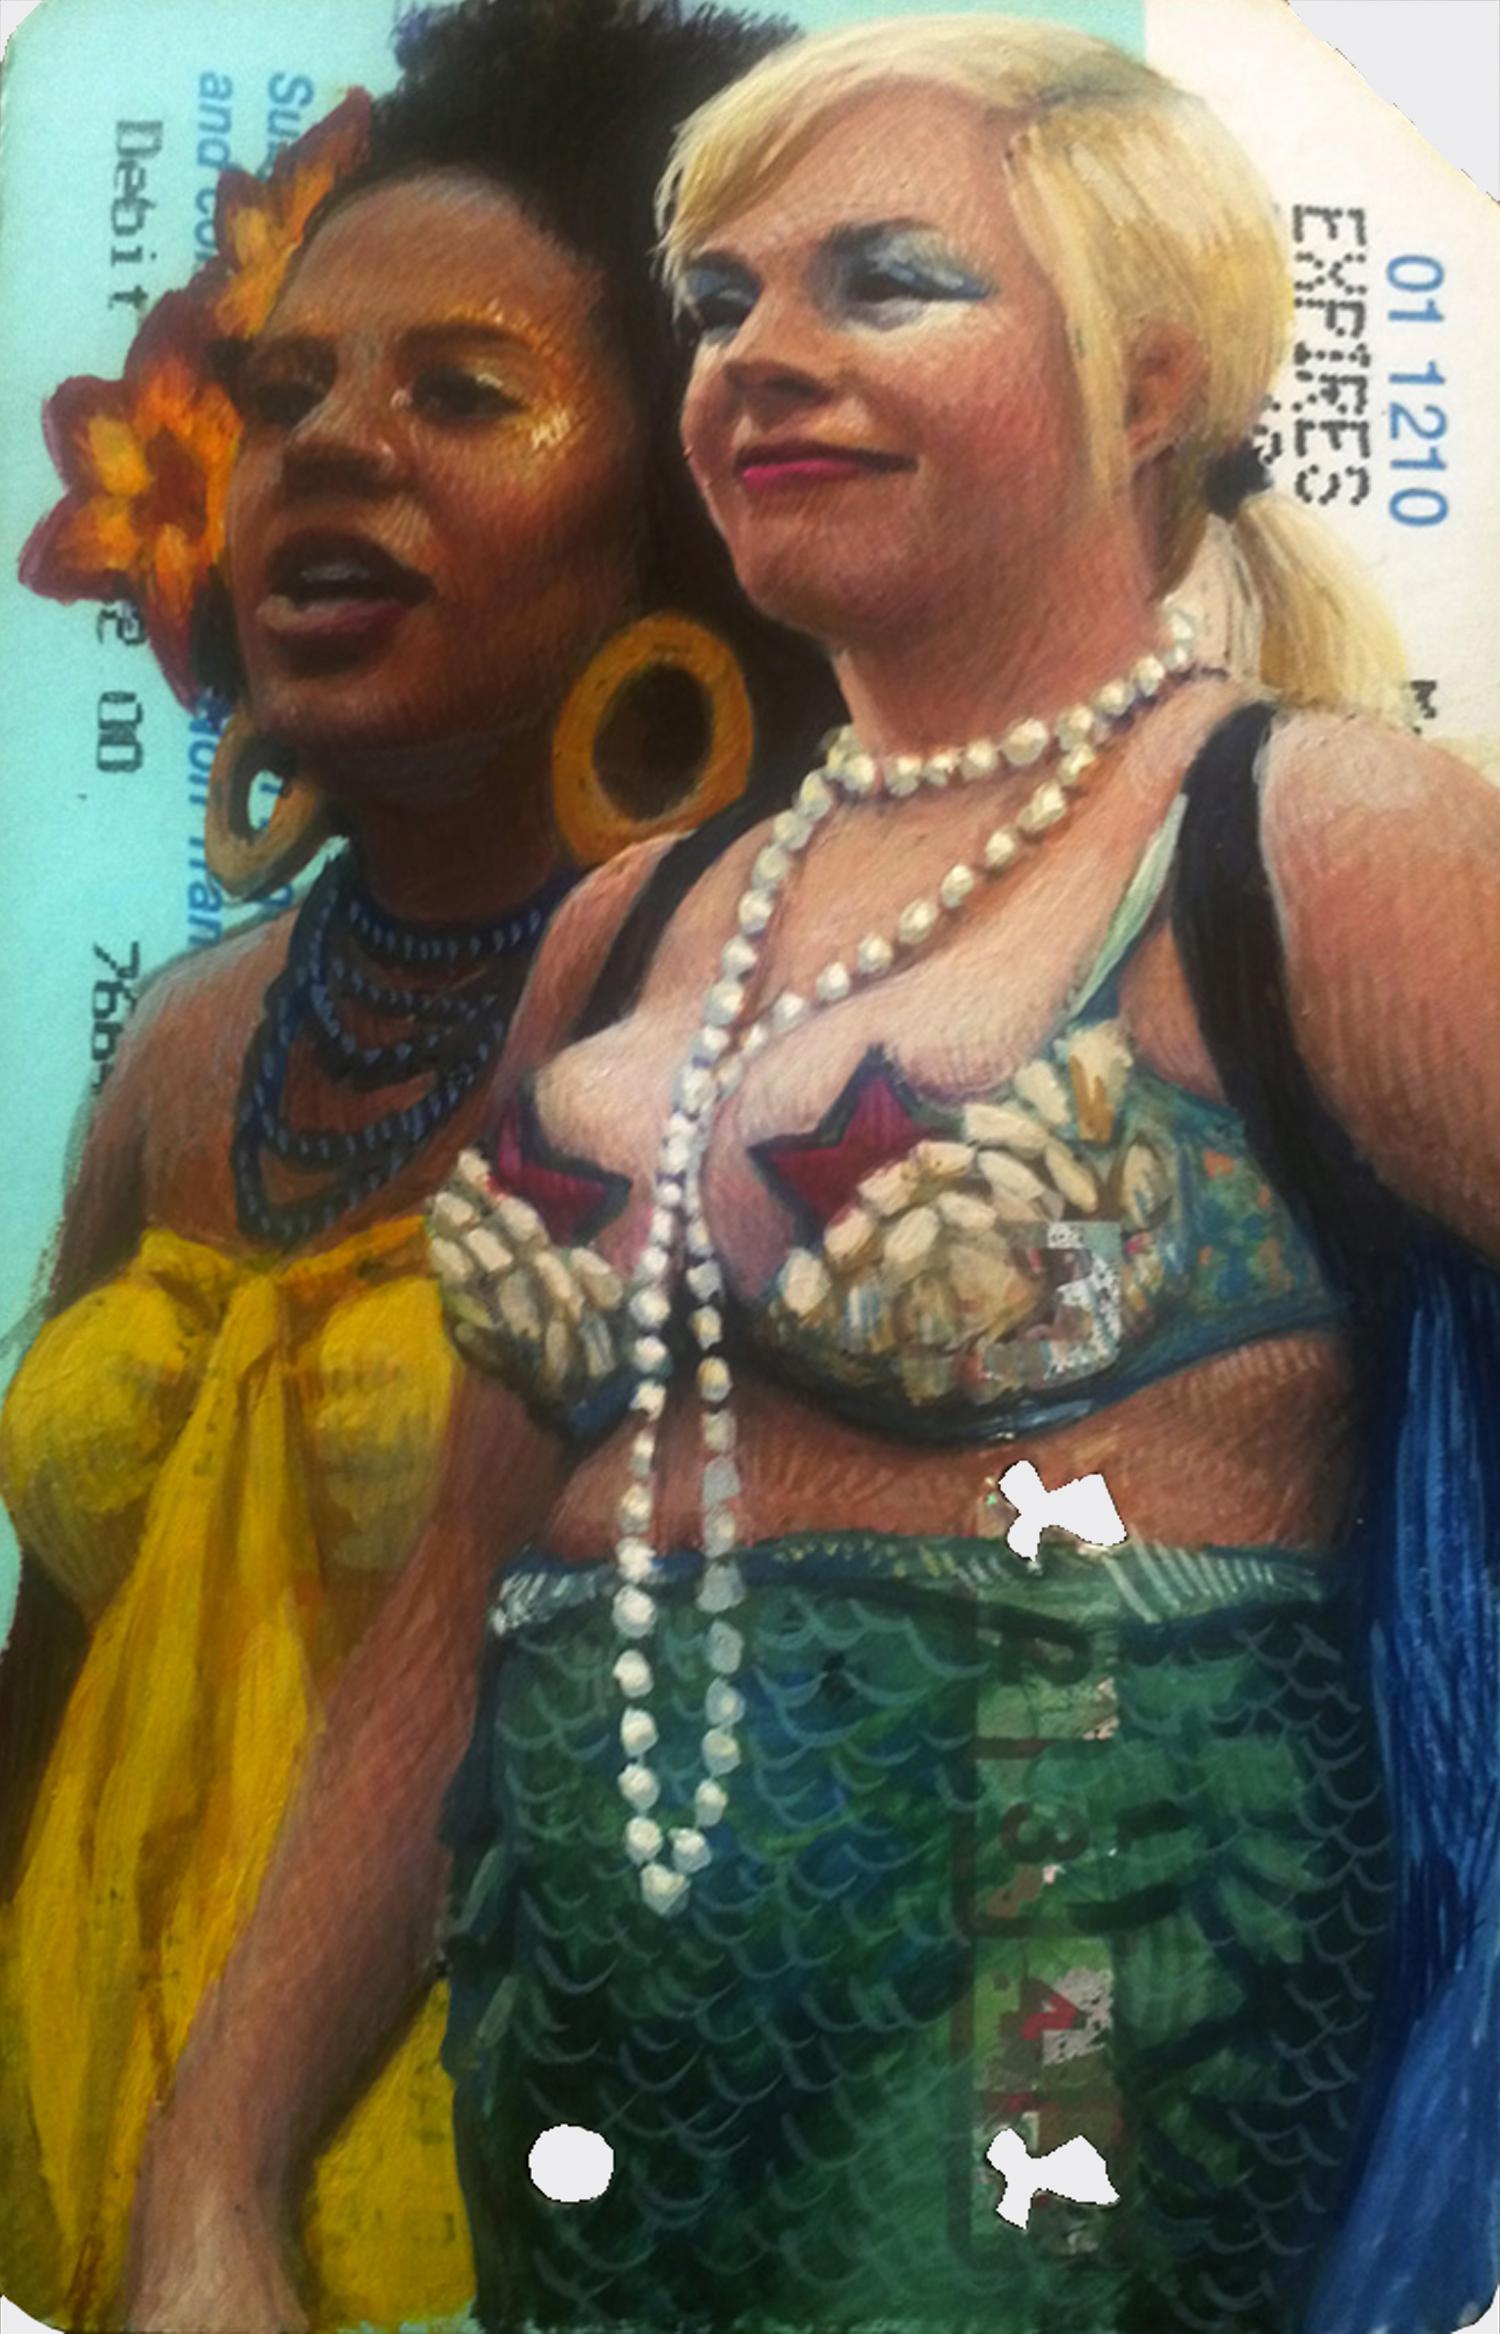 Coney Island Mermaids